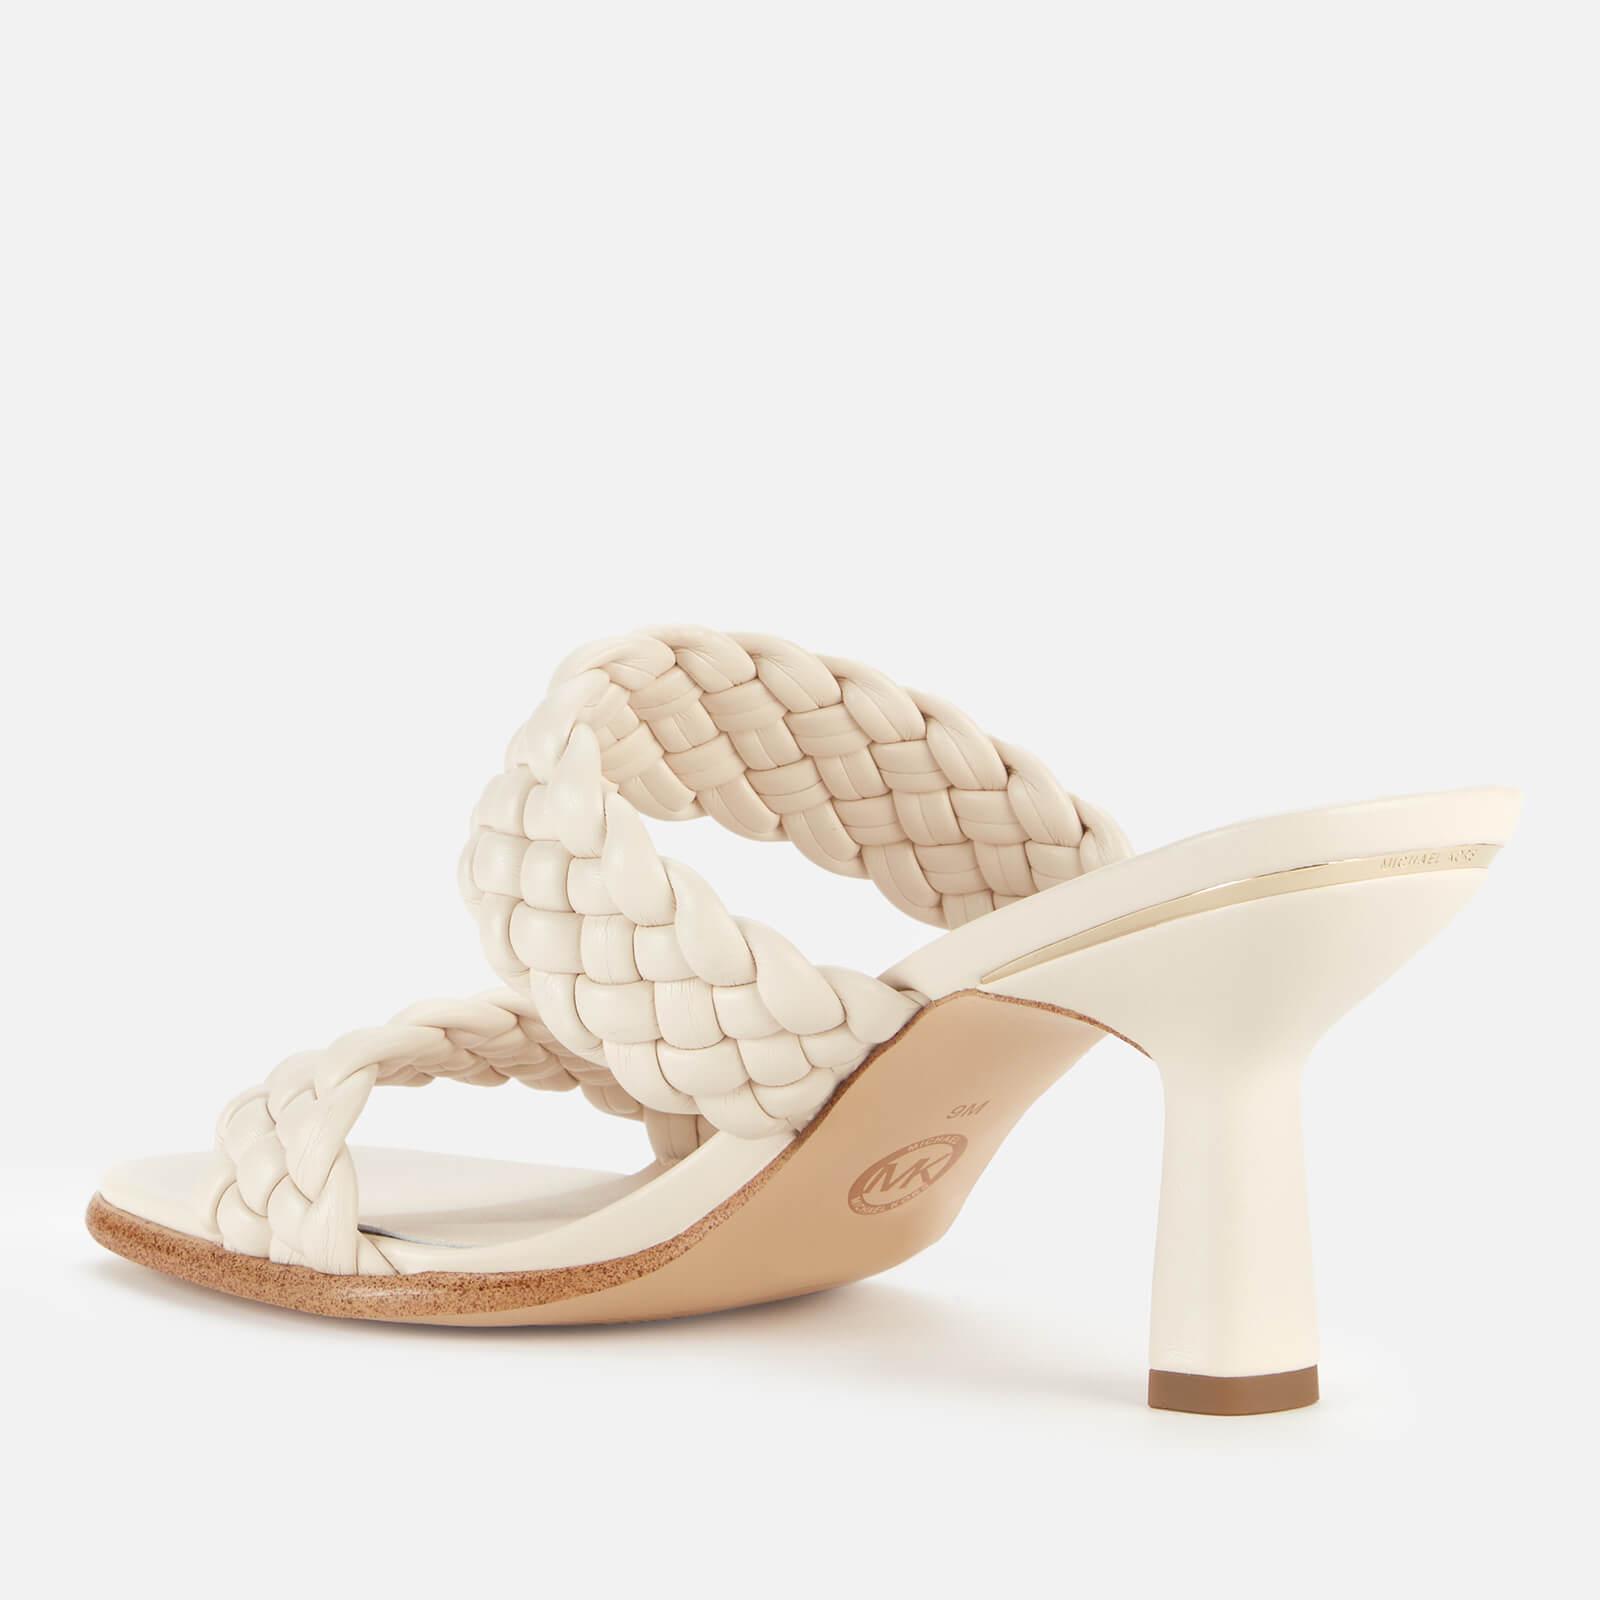 Michael Michael Kors Women's Amelia Leather Heeled Mules - Light Cream - Uk 8 40s1ammp1l Mens Footwear, White